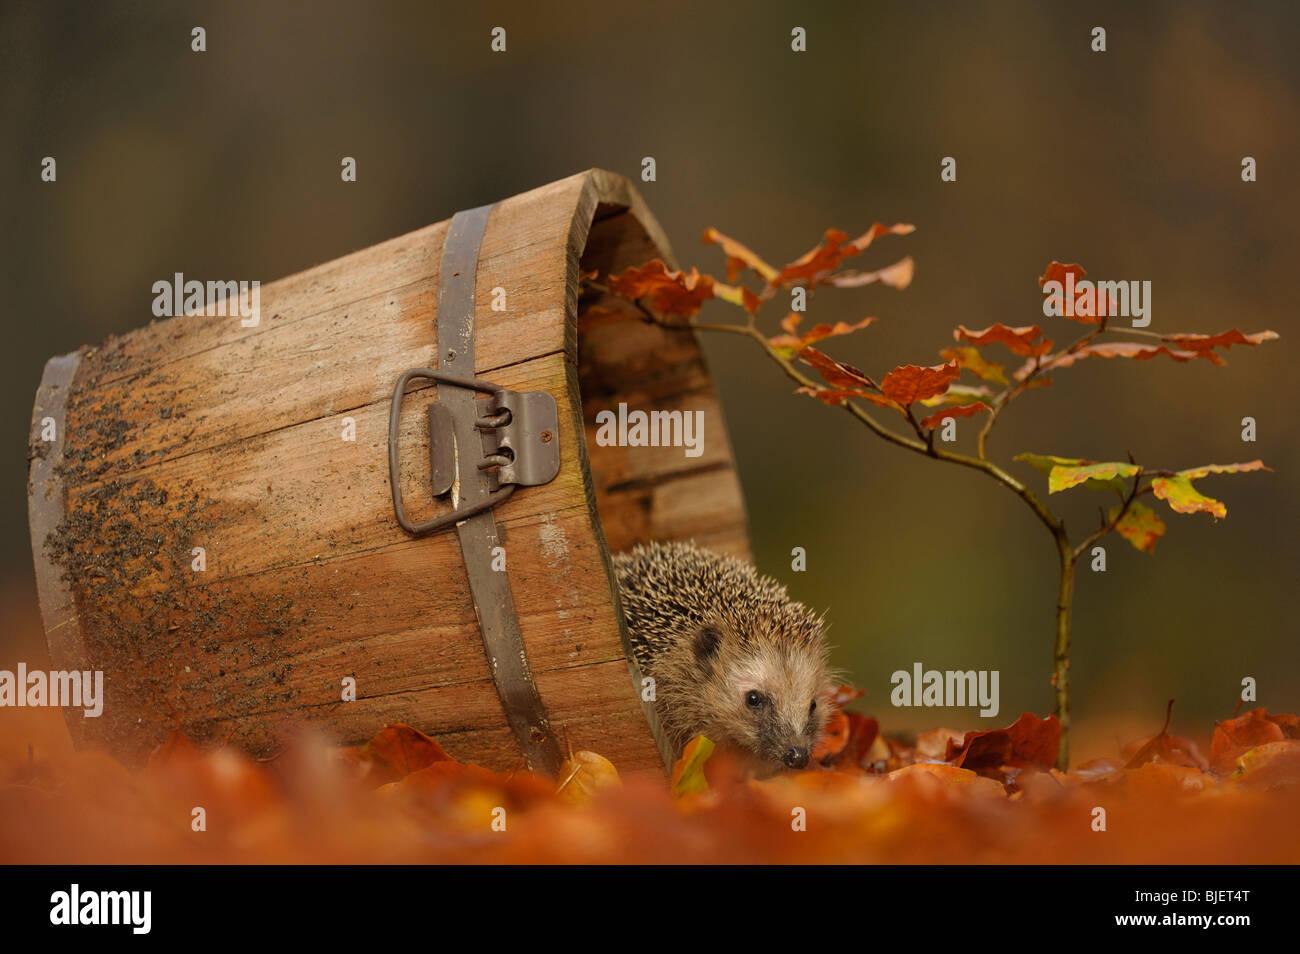 Hedgehog (Erinaceus europaeus) in a garden foraging in Beech leaves, Netherlands. - Stock Image